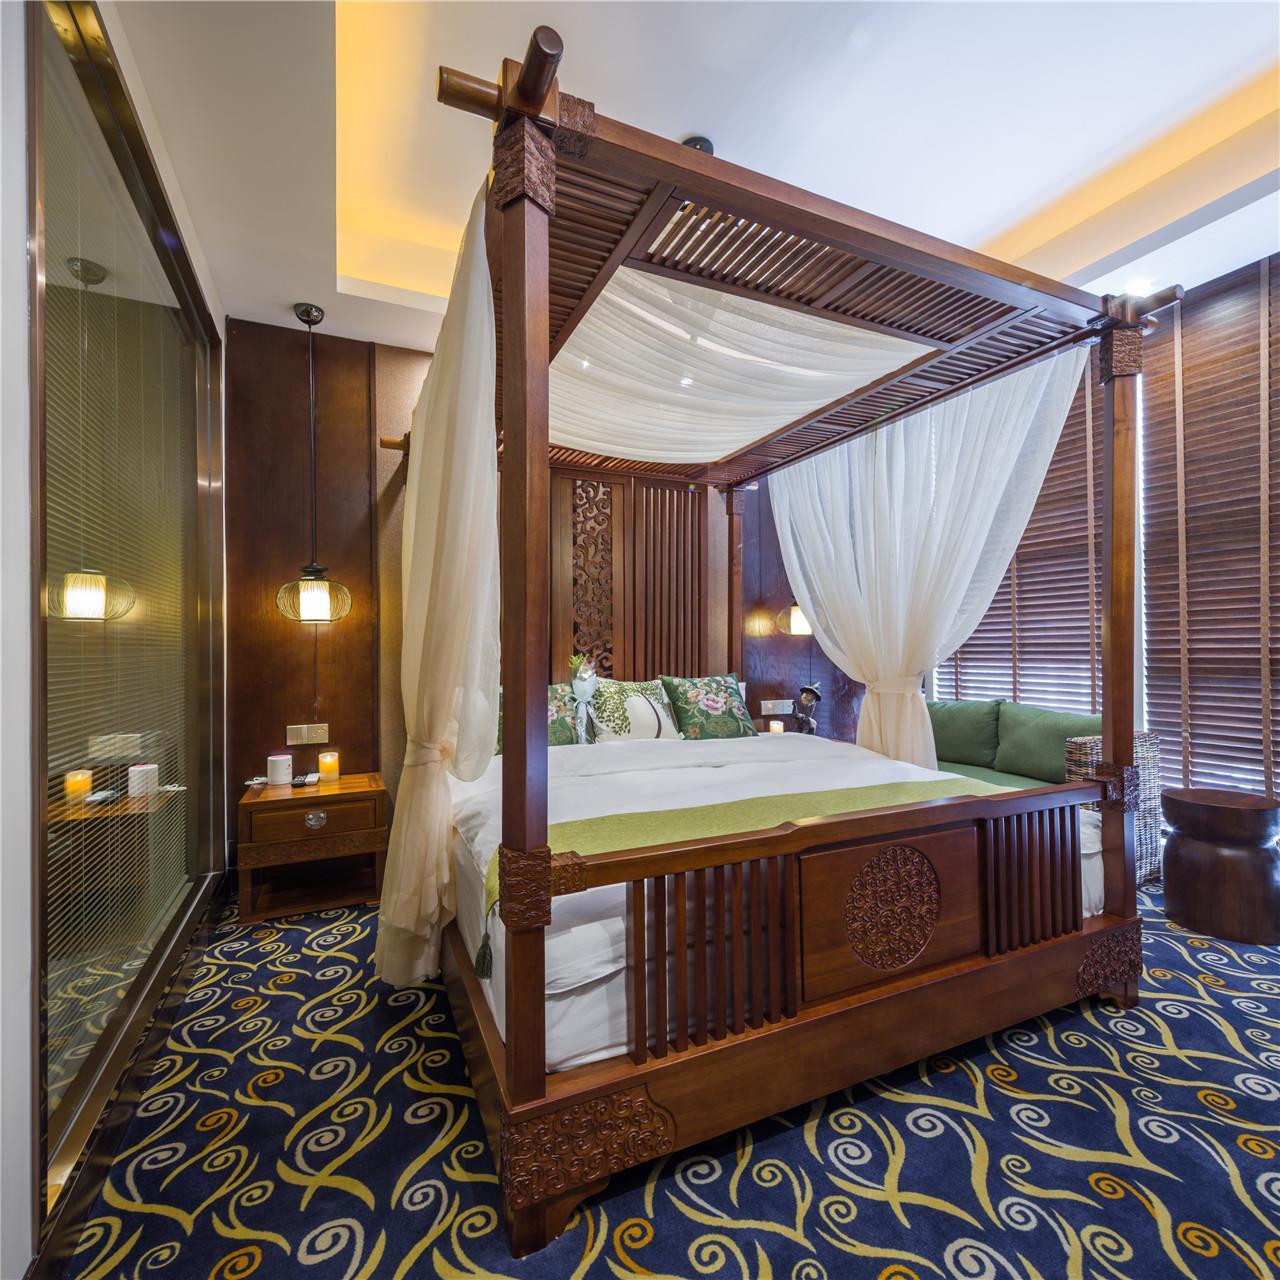 City Exdlusise Celebritier Hotel Changzhou China